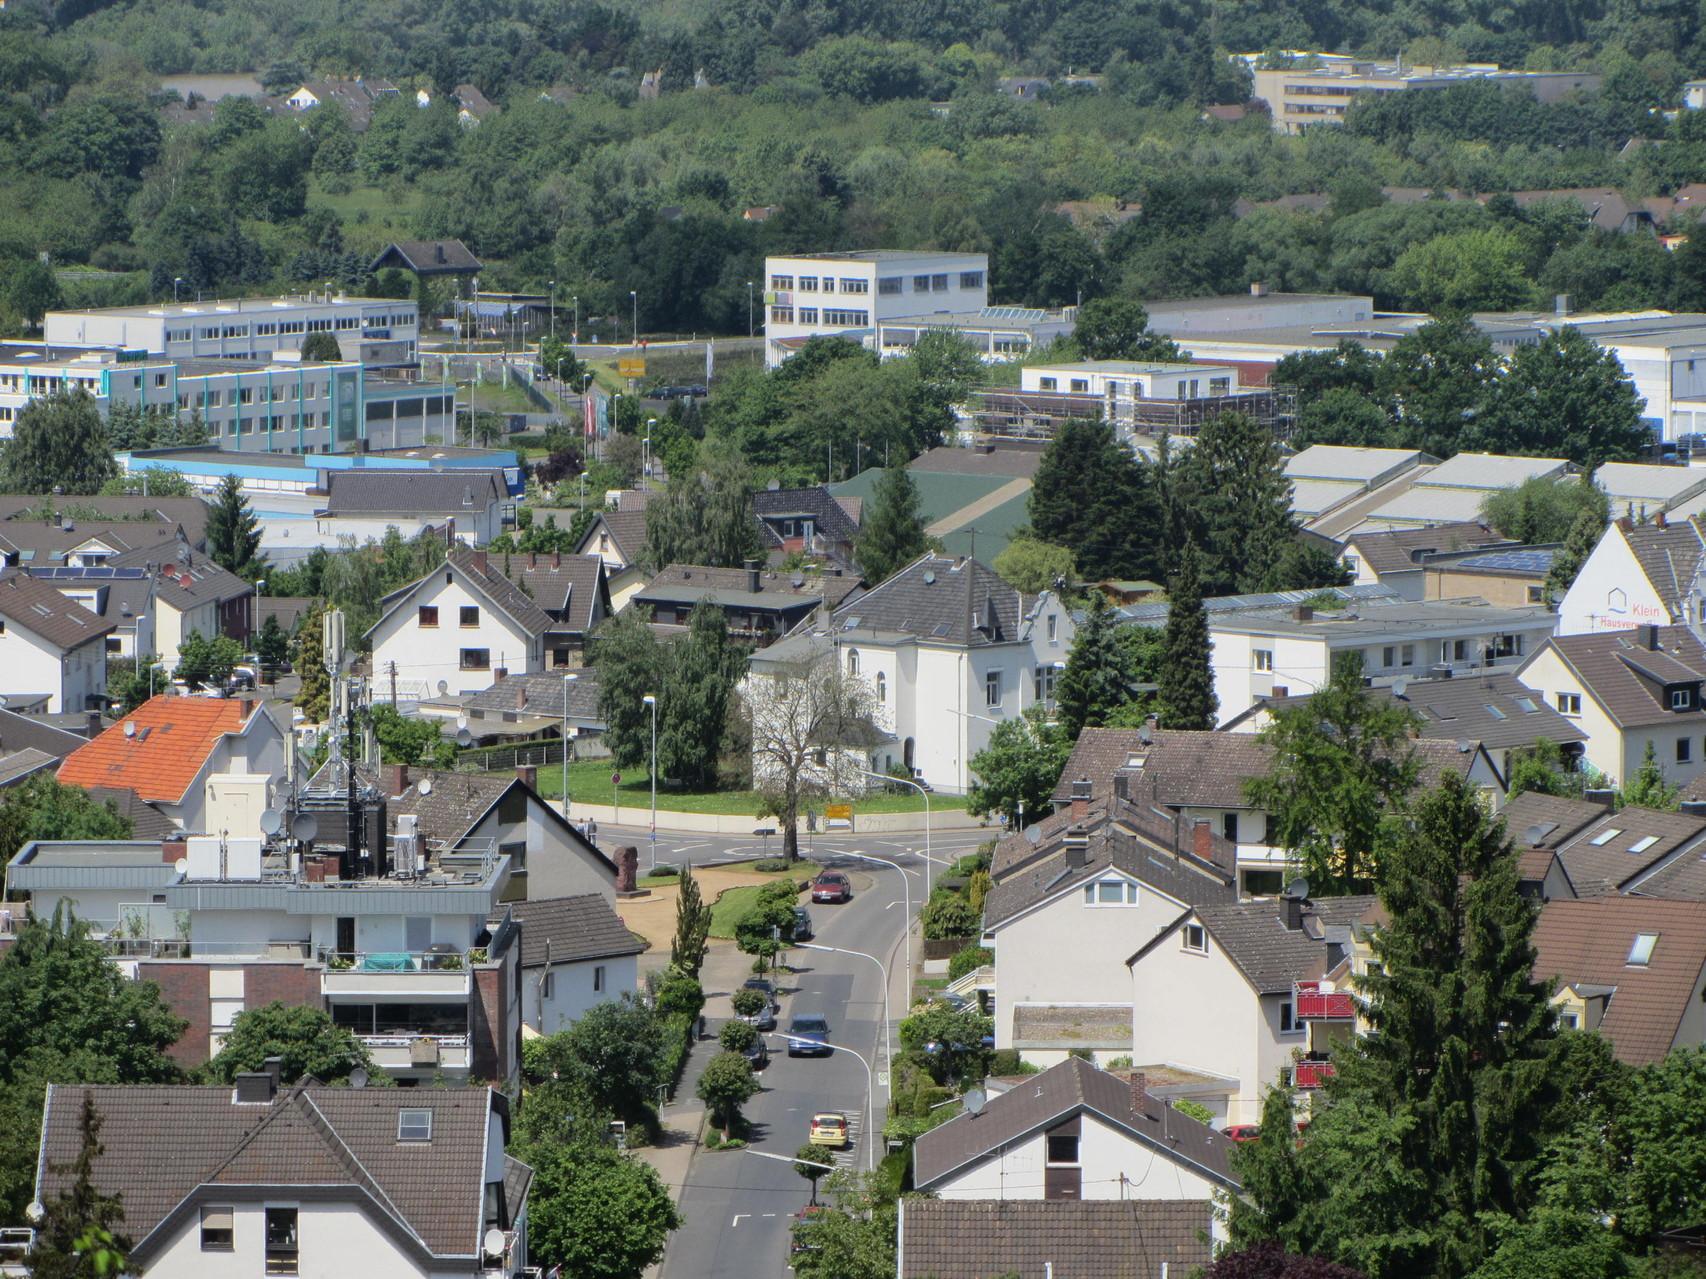 Rheinbreitbach